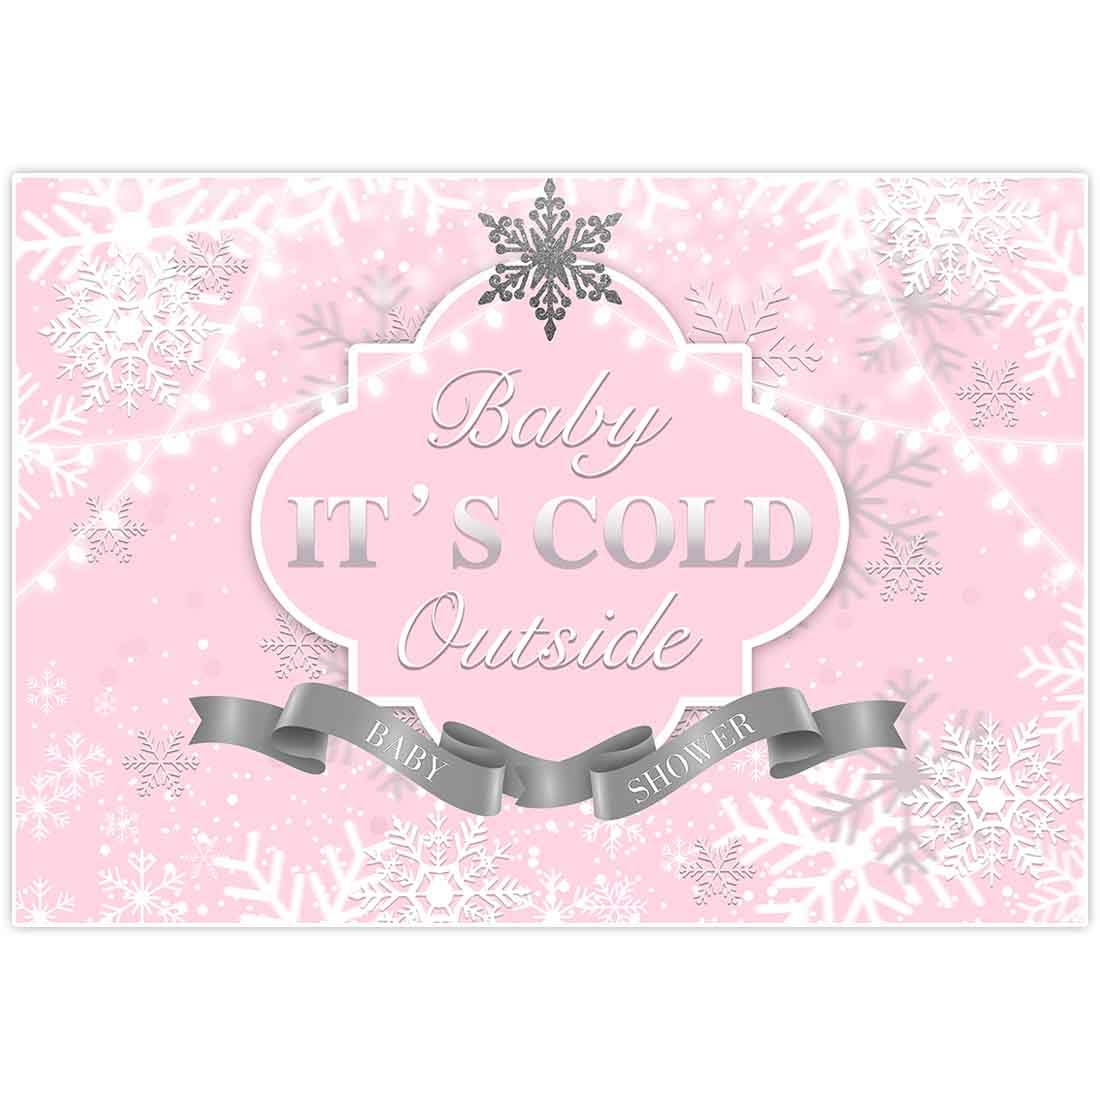 Allenjoy 8x6ft Baby It's Cold Outside Backdrop Winter Wonderland Girl Princess 1st Birthday Baby Shower Baptism Pink Sliver Snowflake Sparkle Glitter Photography Background Banner Decorations Props